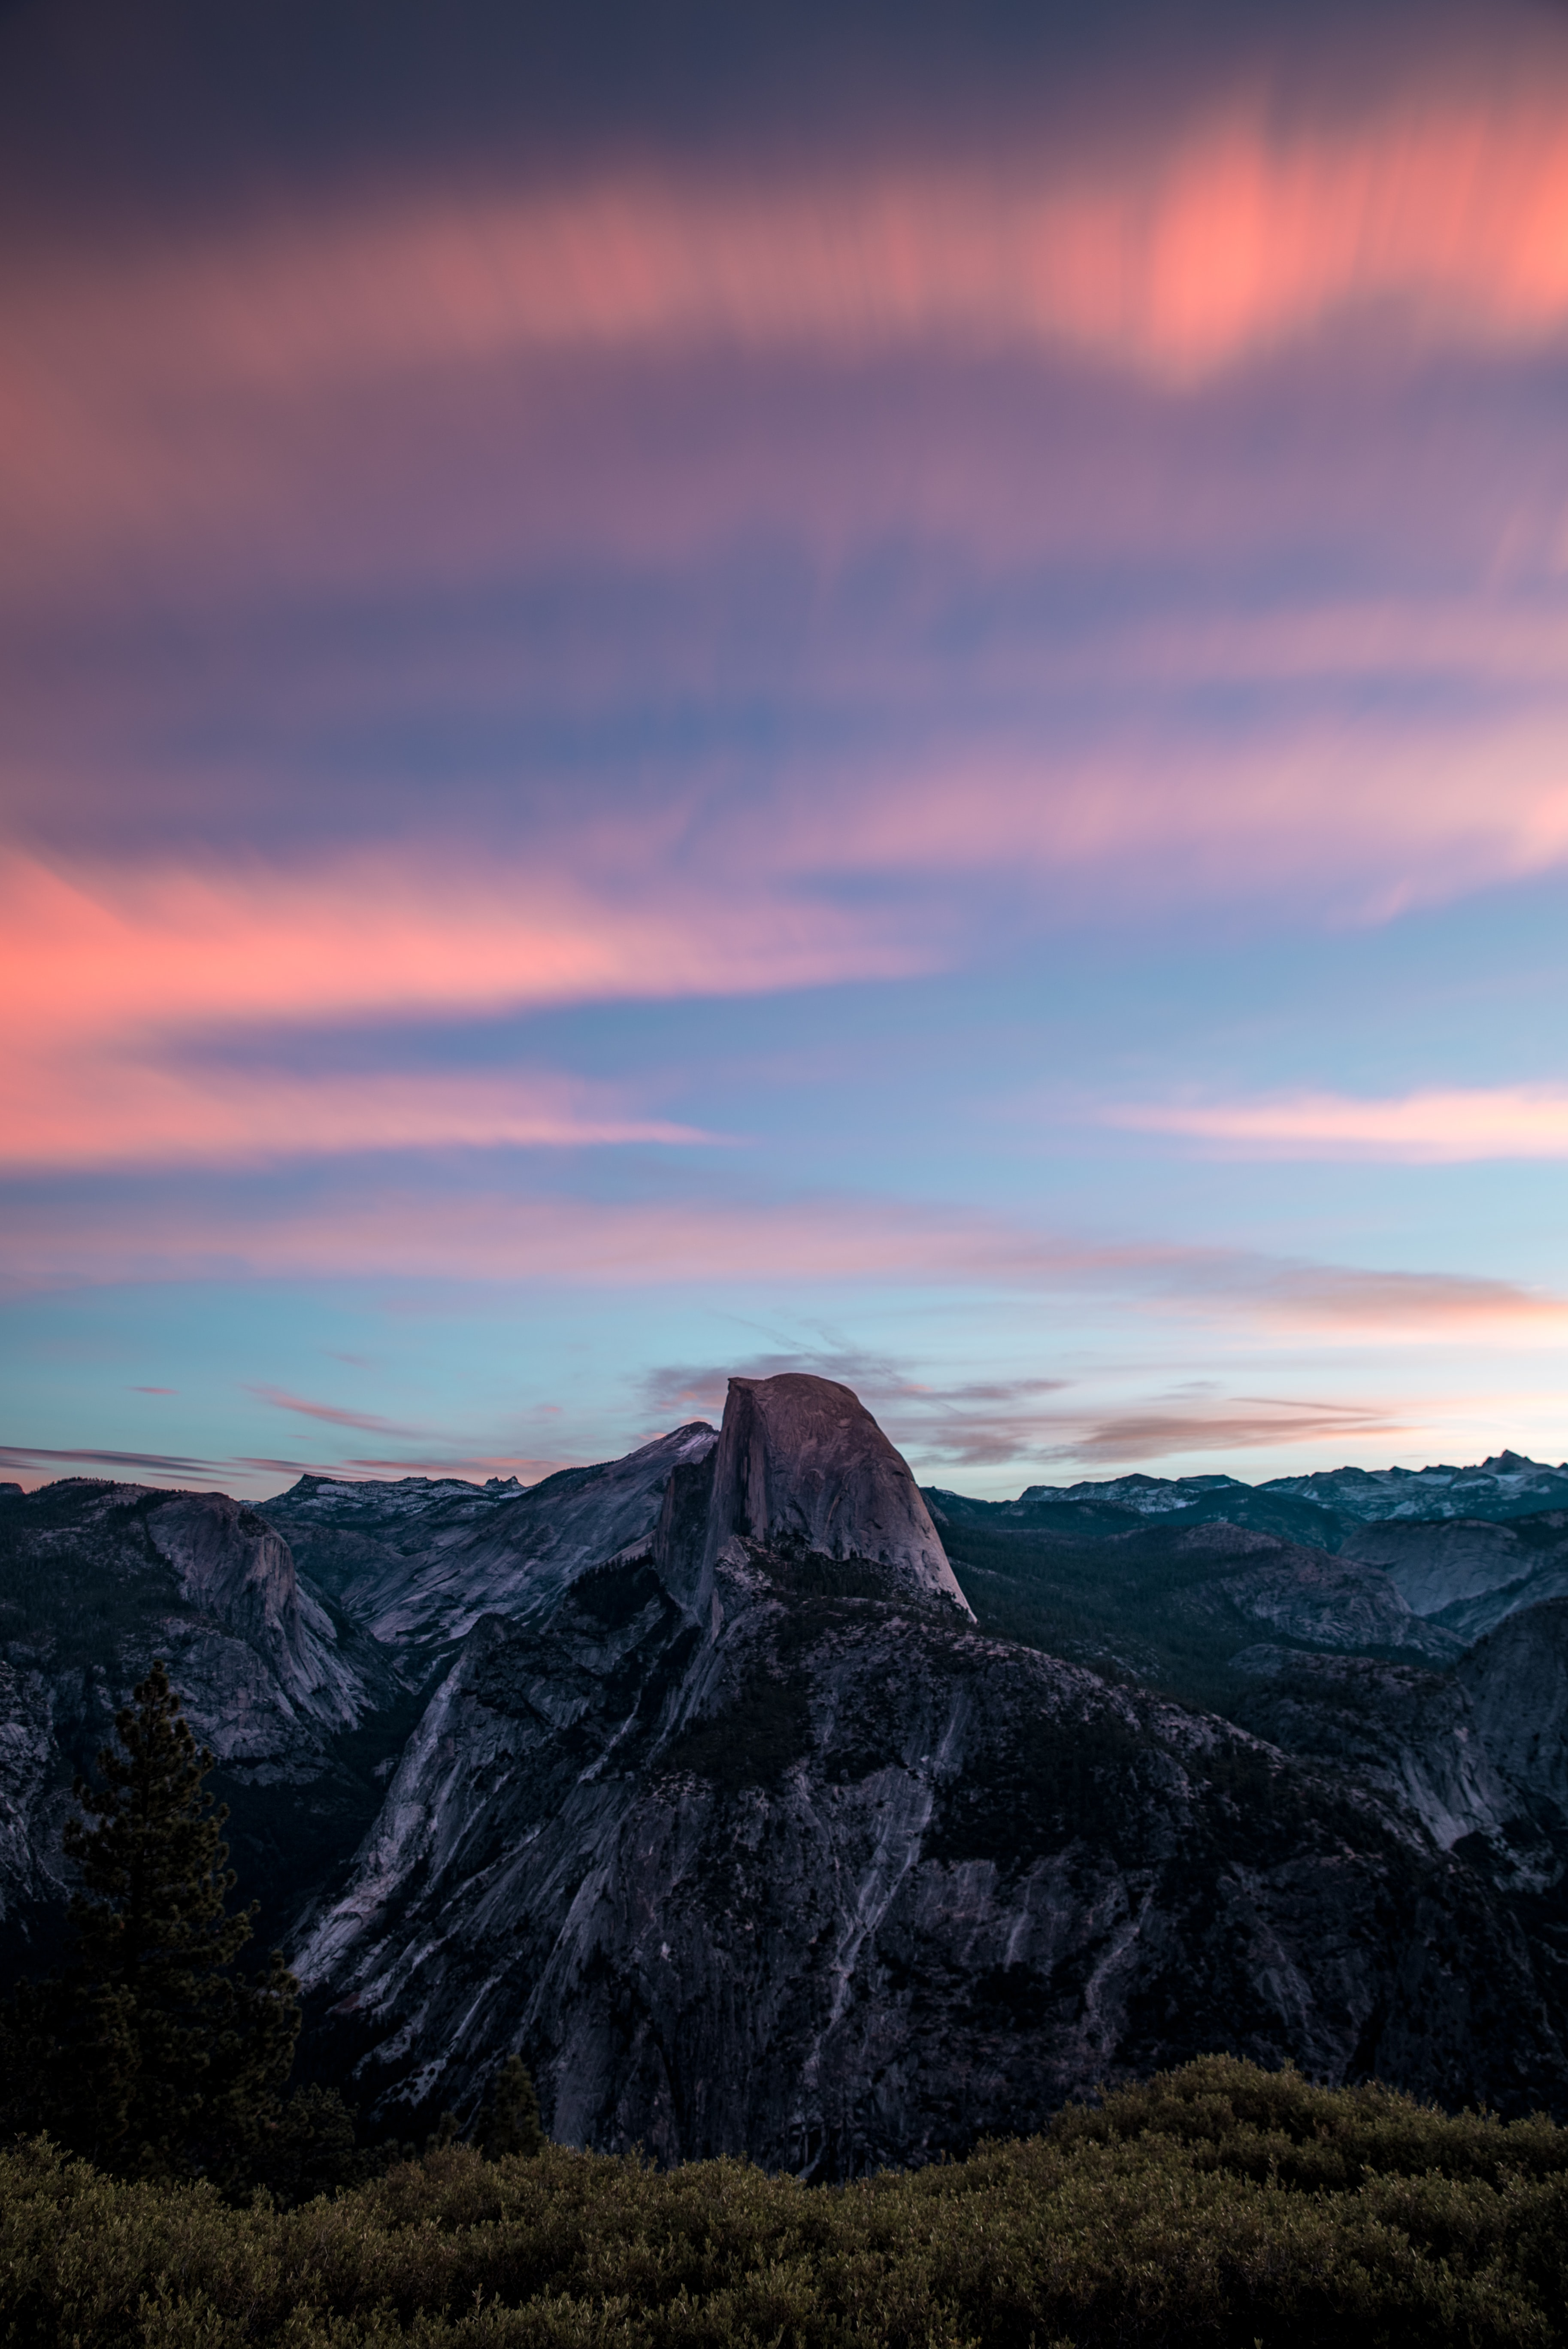 landscape photography of gray mountain under horizon